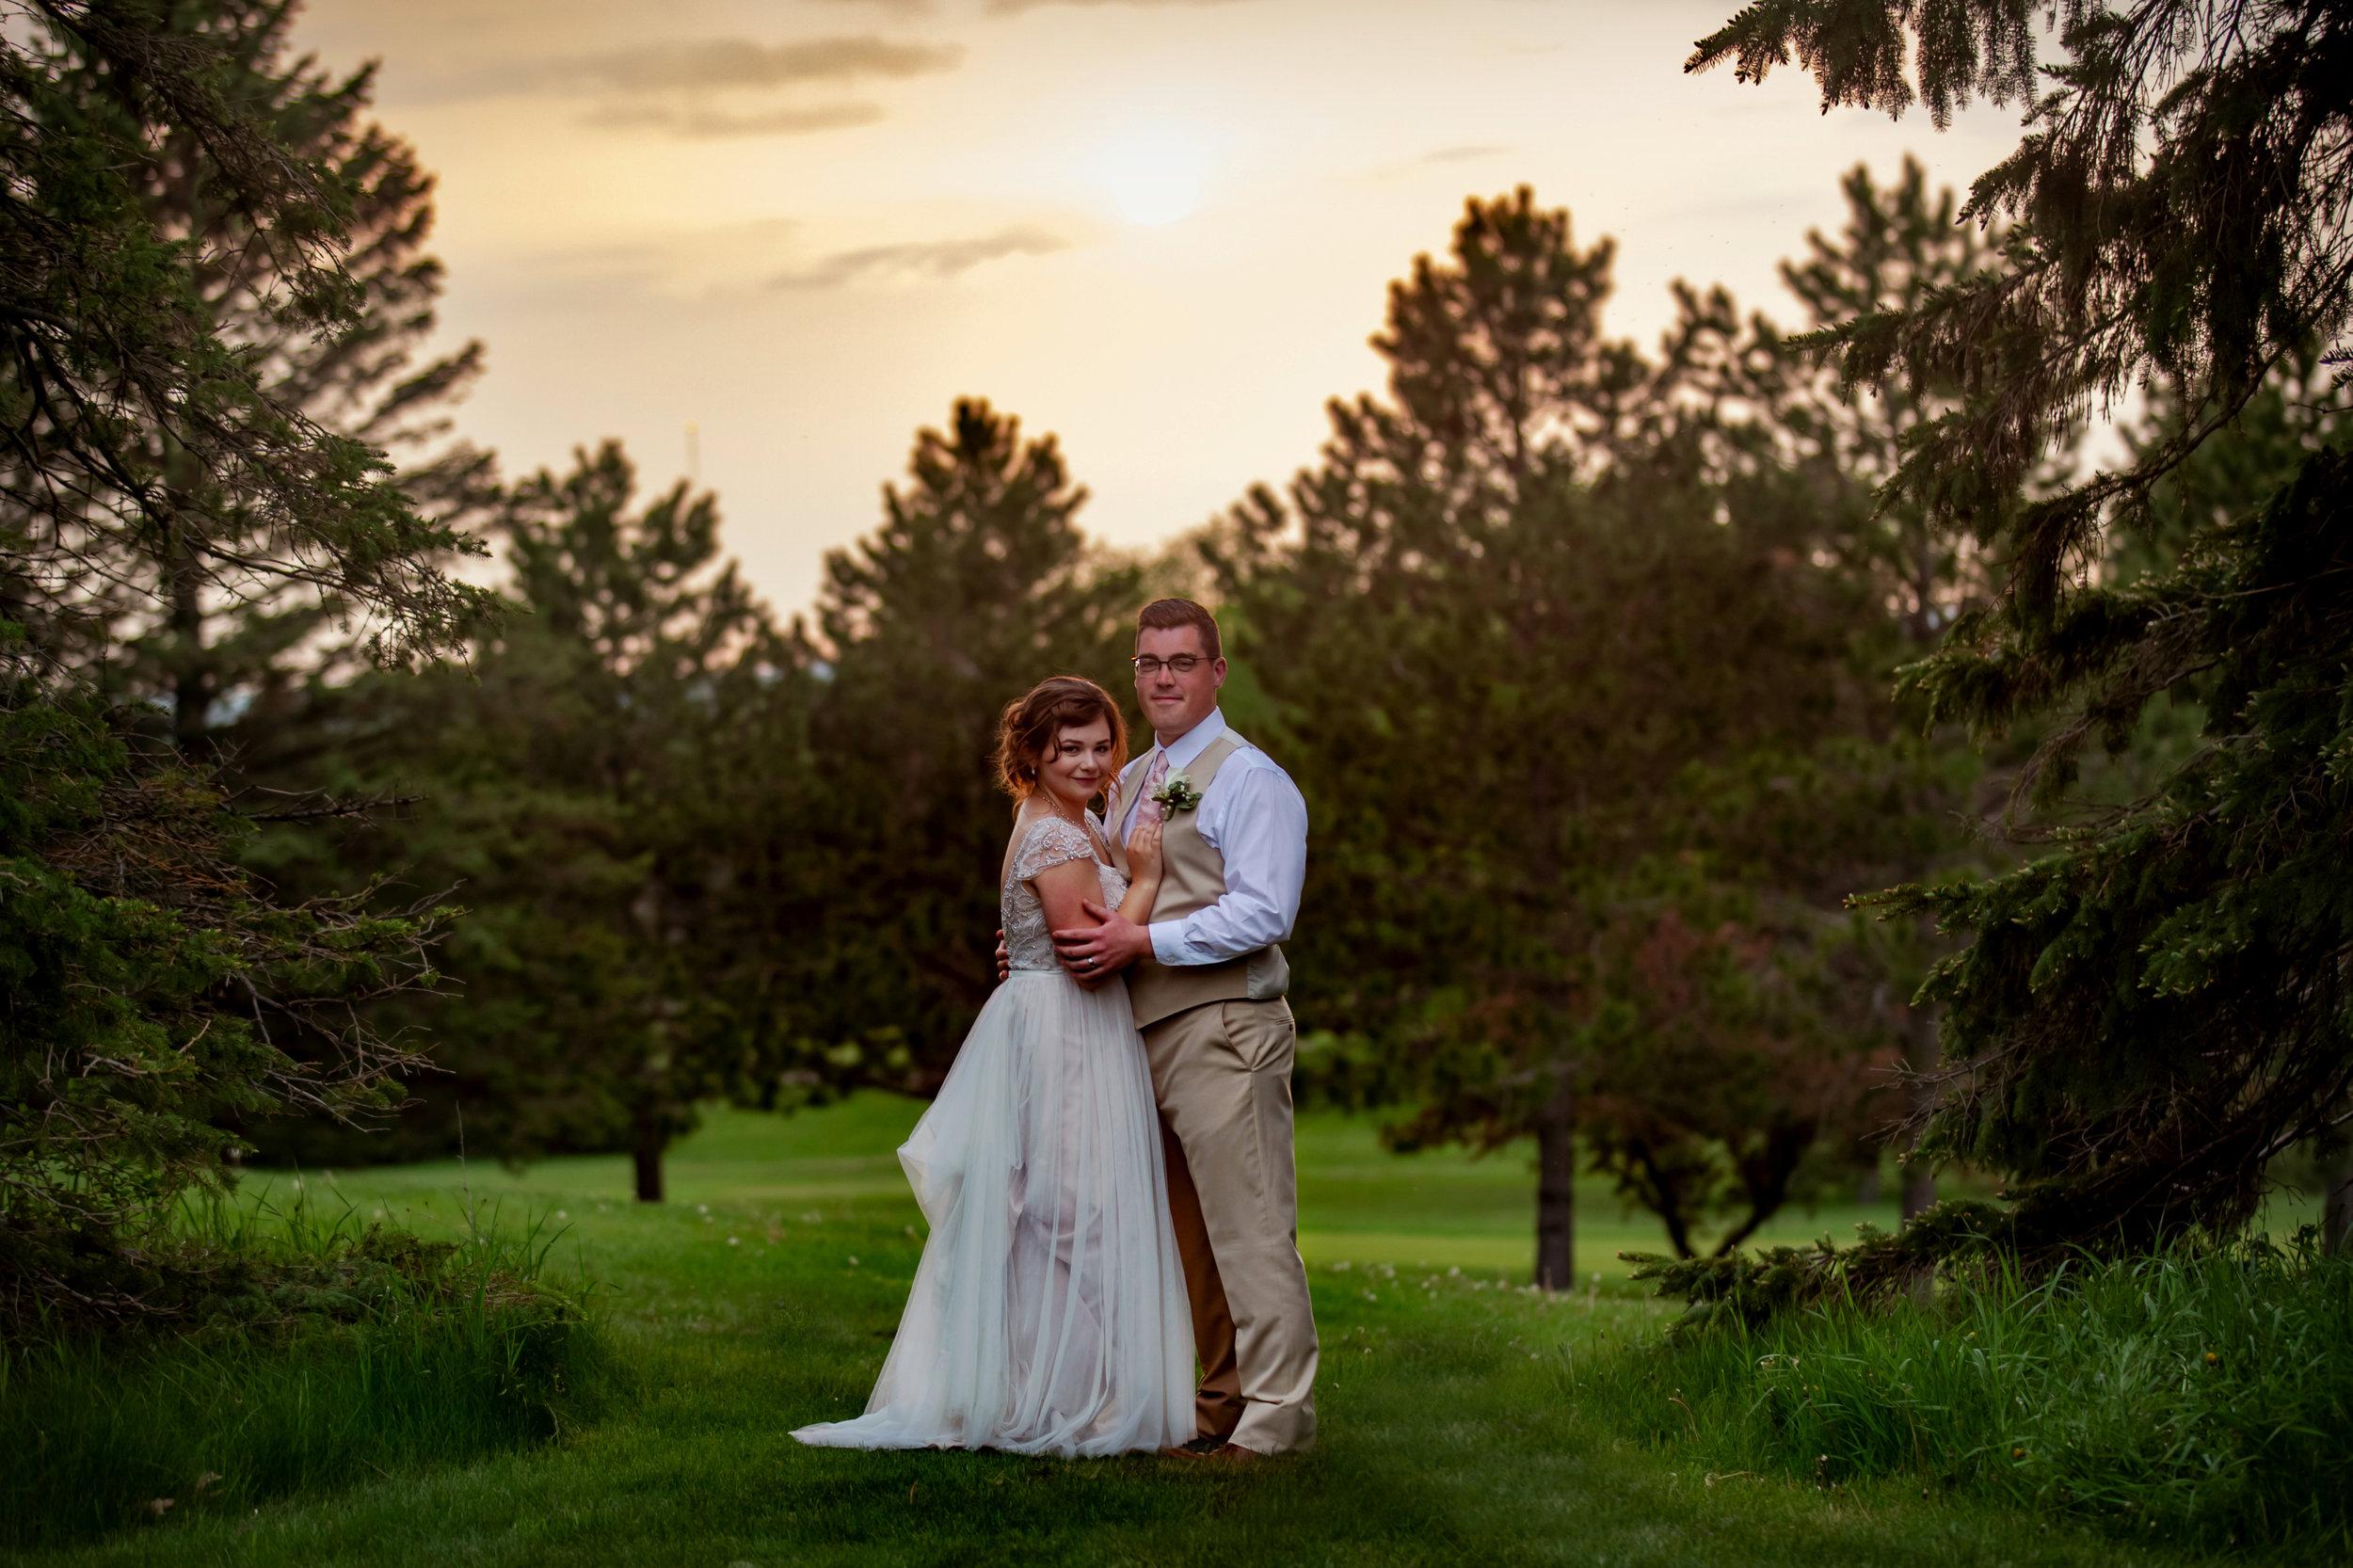 Gines Wedding 6.1.2019 Cadillac, Michigan.